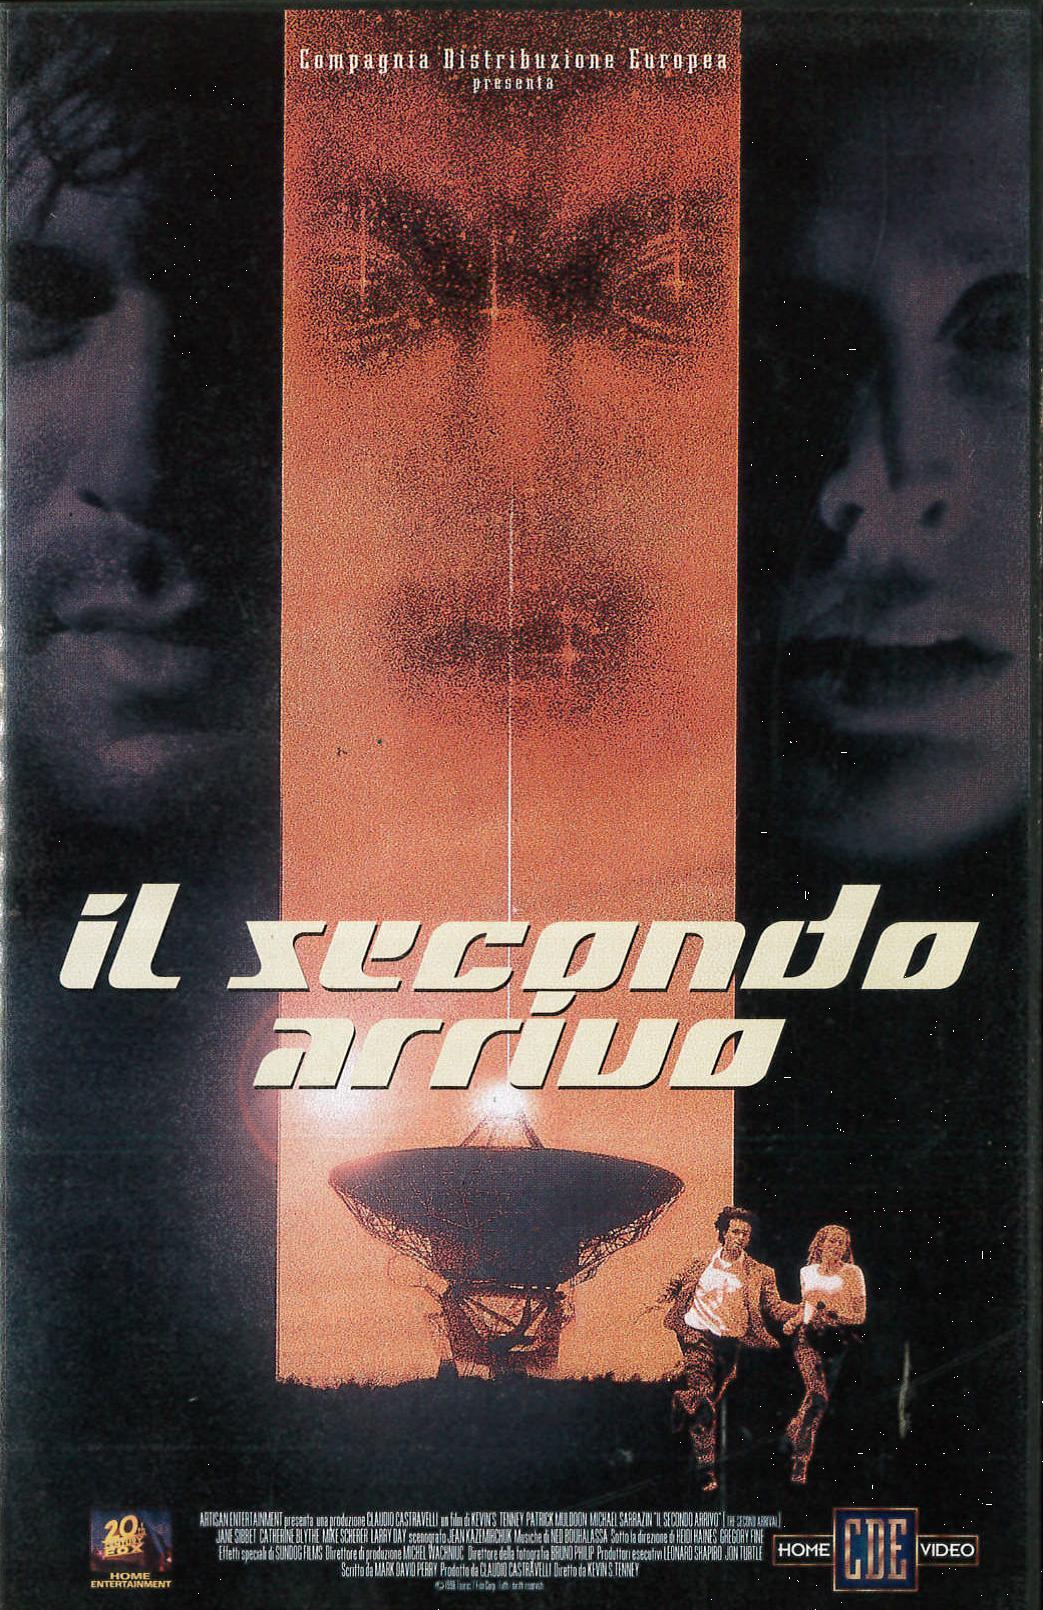 IL SECONDO ARRIVO - VHS EX NOLEGGIO (VHS)